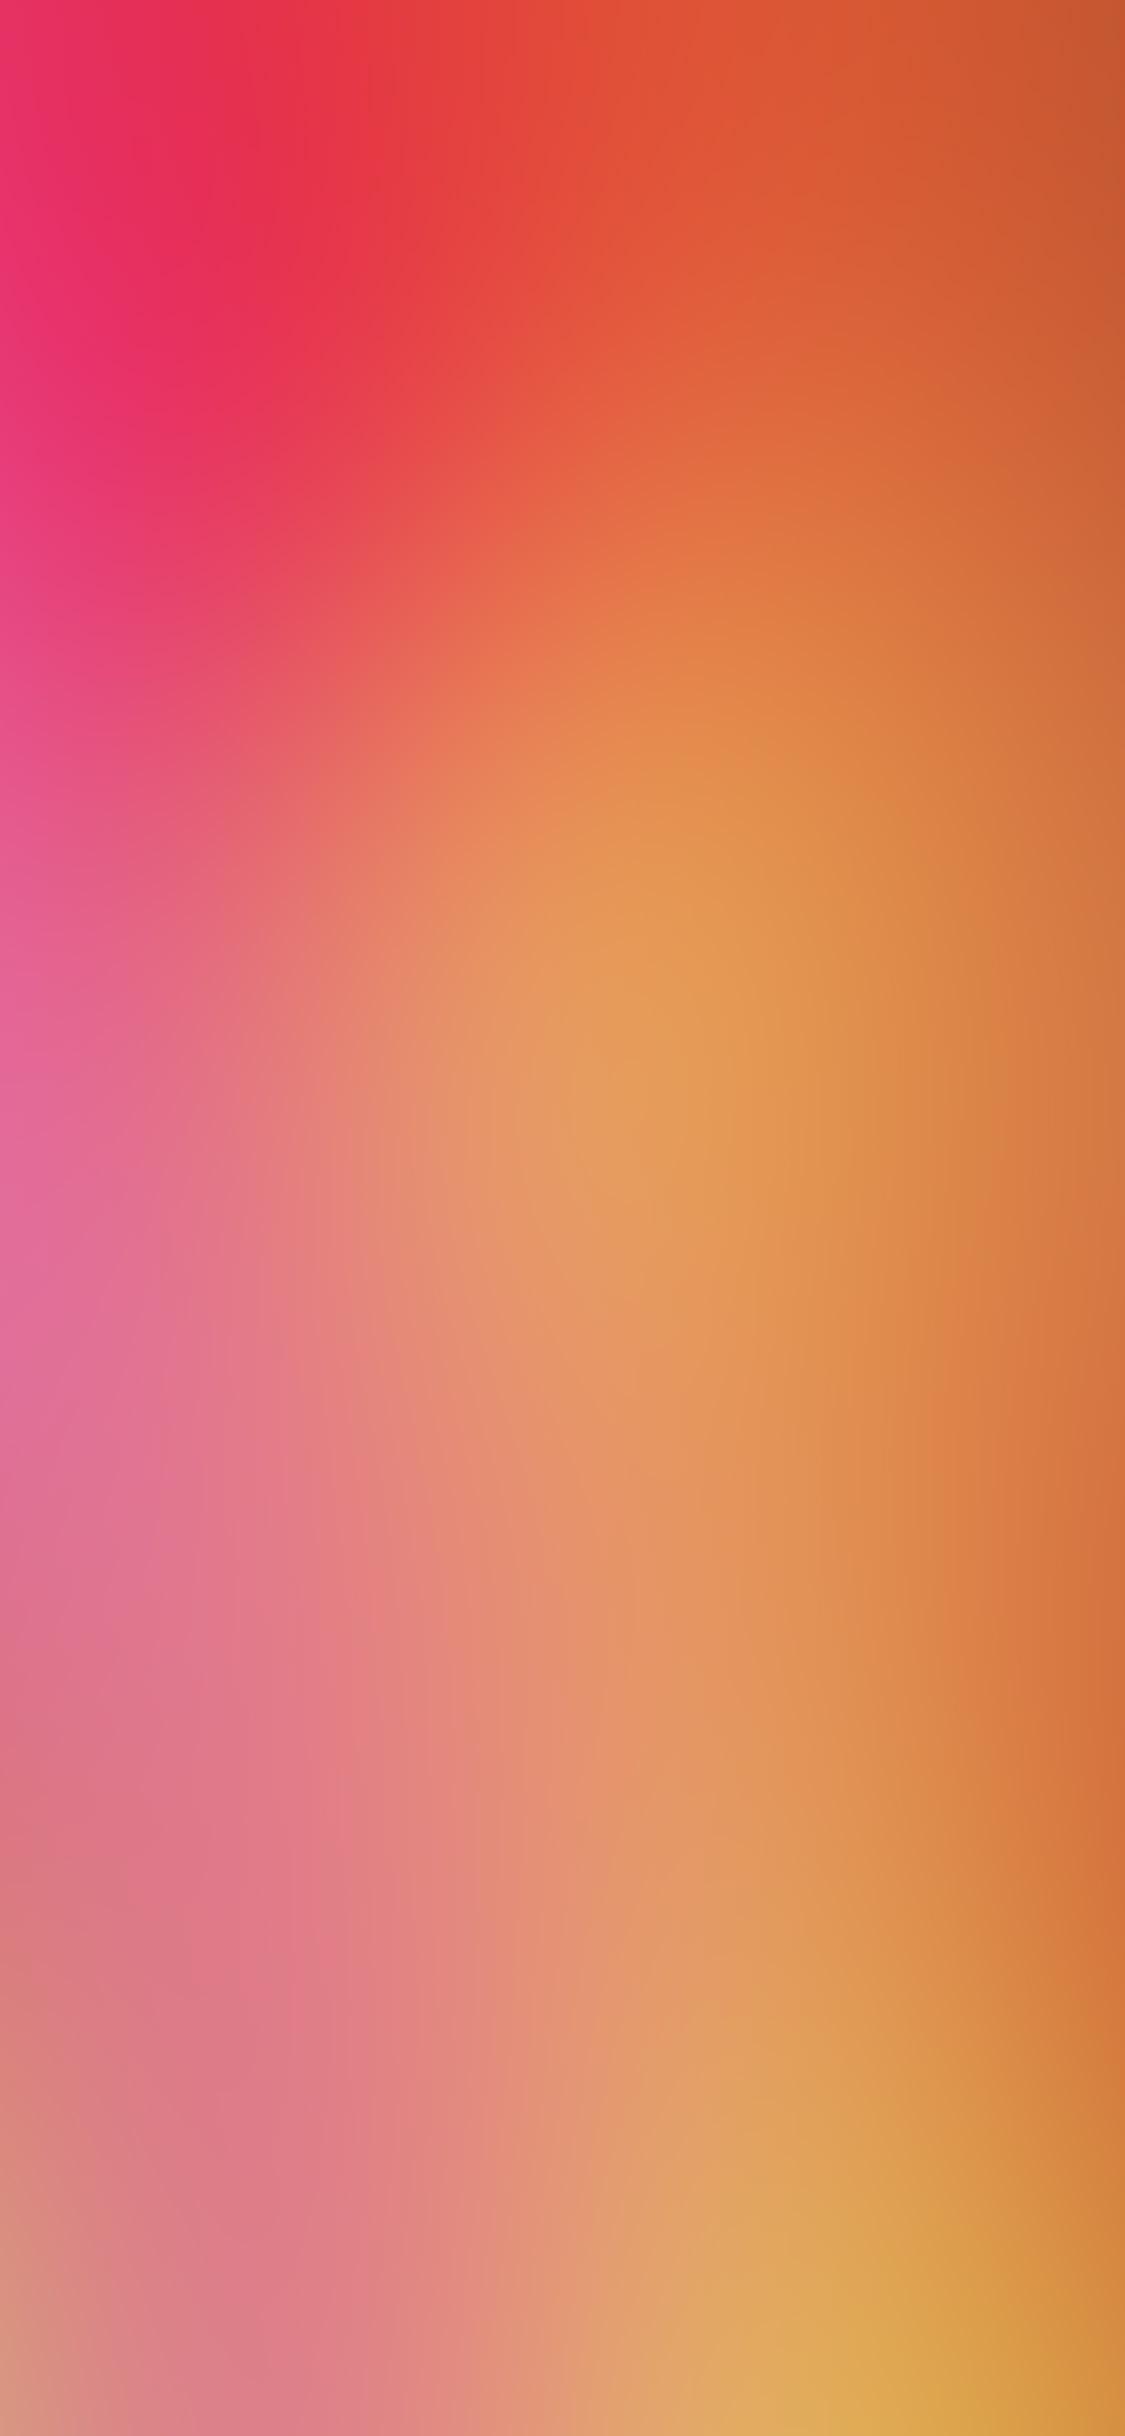 iPhonexpapers.com-Apple-iPhone-wallpaper-so31-blur-gradation-hot